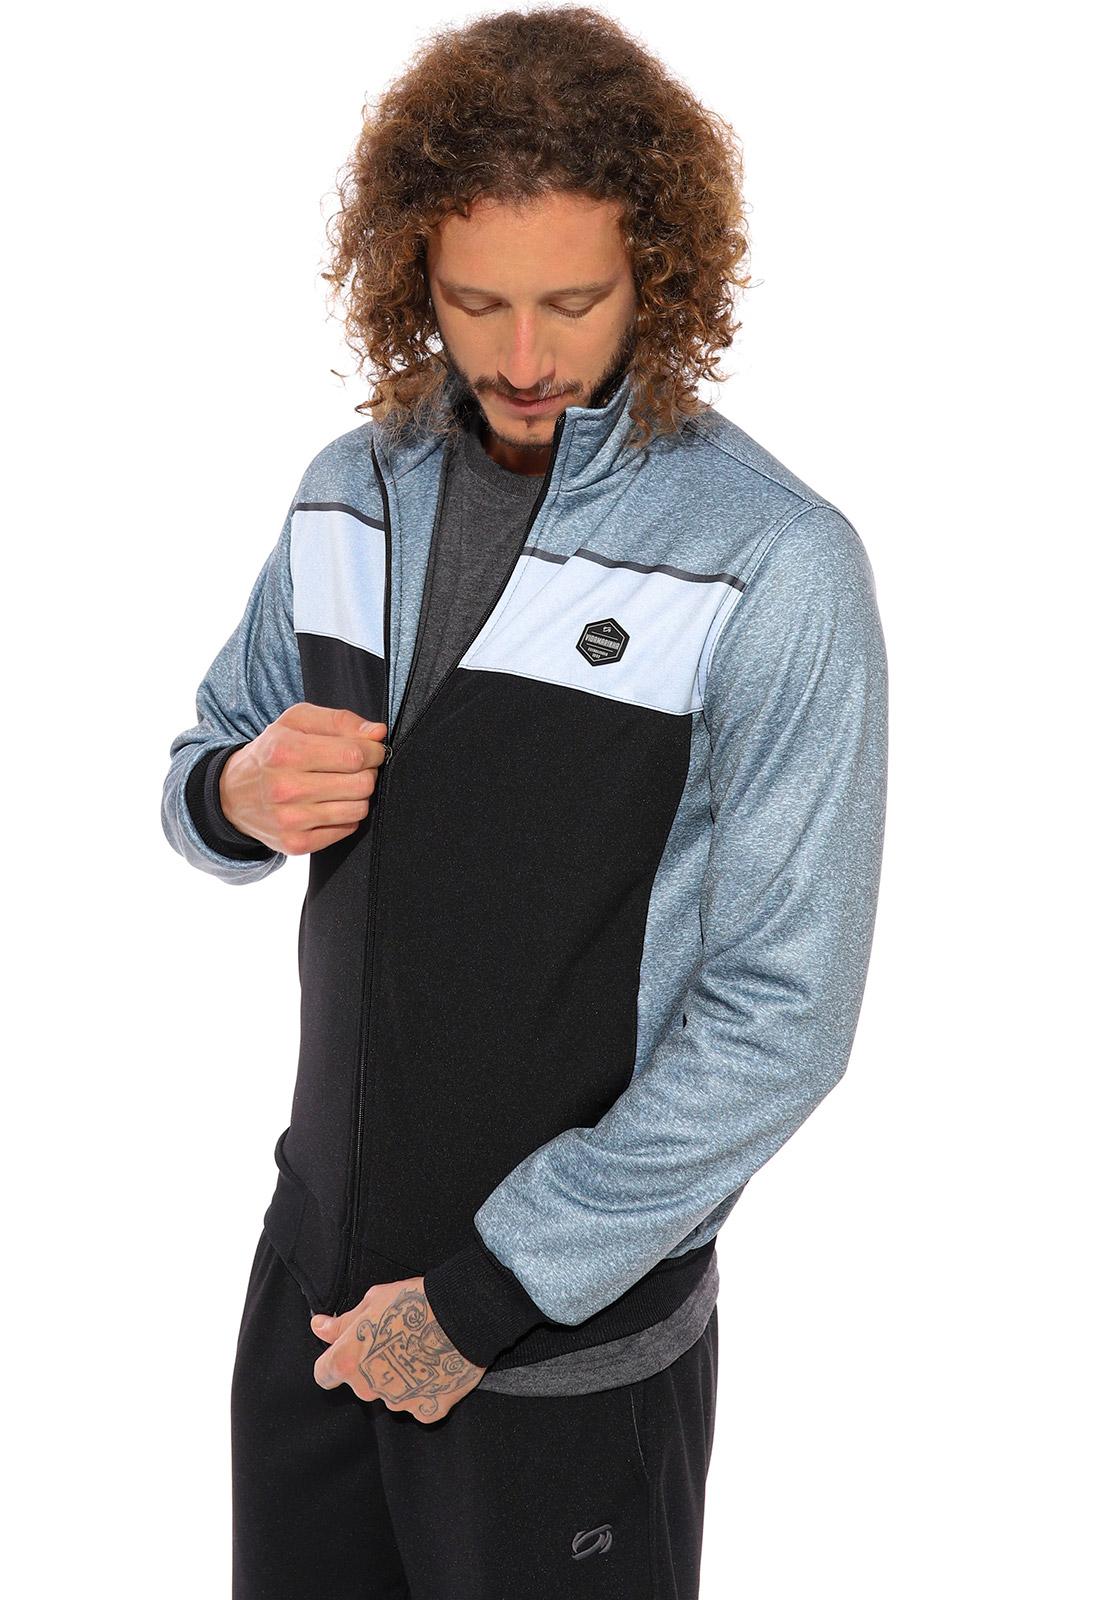 Blusa de Helanca Plus Size Vida Marinha Canguru Aberto Azul/Preto